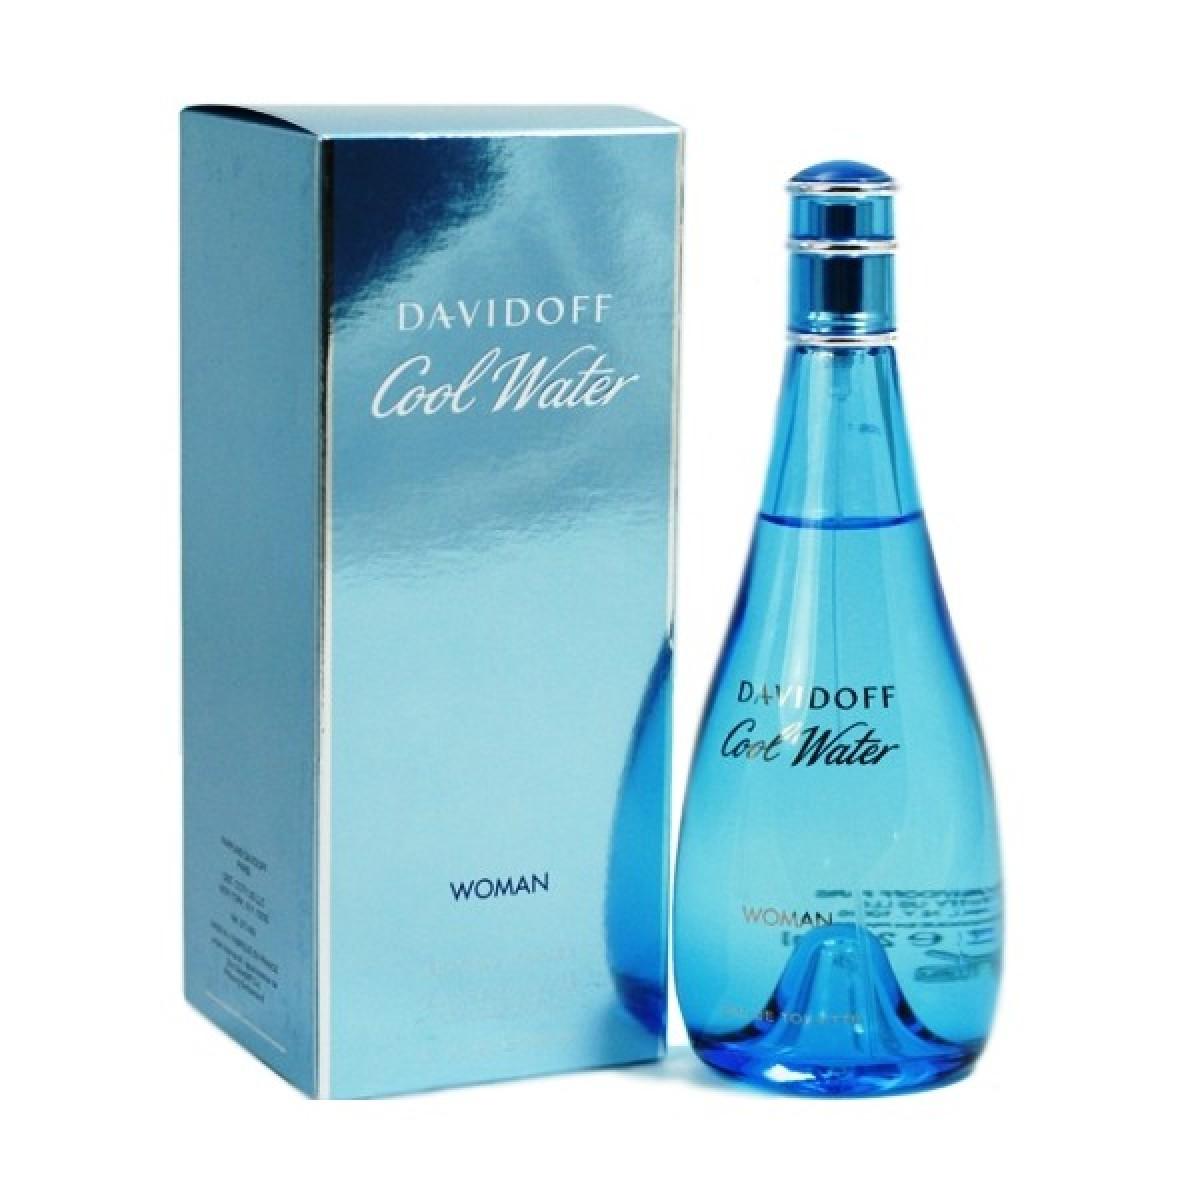 Davidoff Cool Water Woman - toaletní voda W Objem: 50 ml